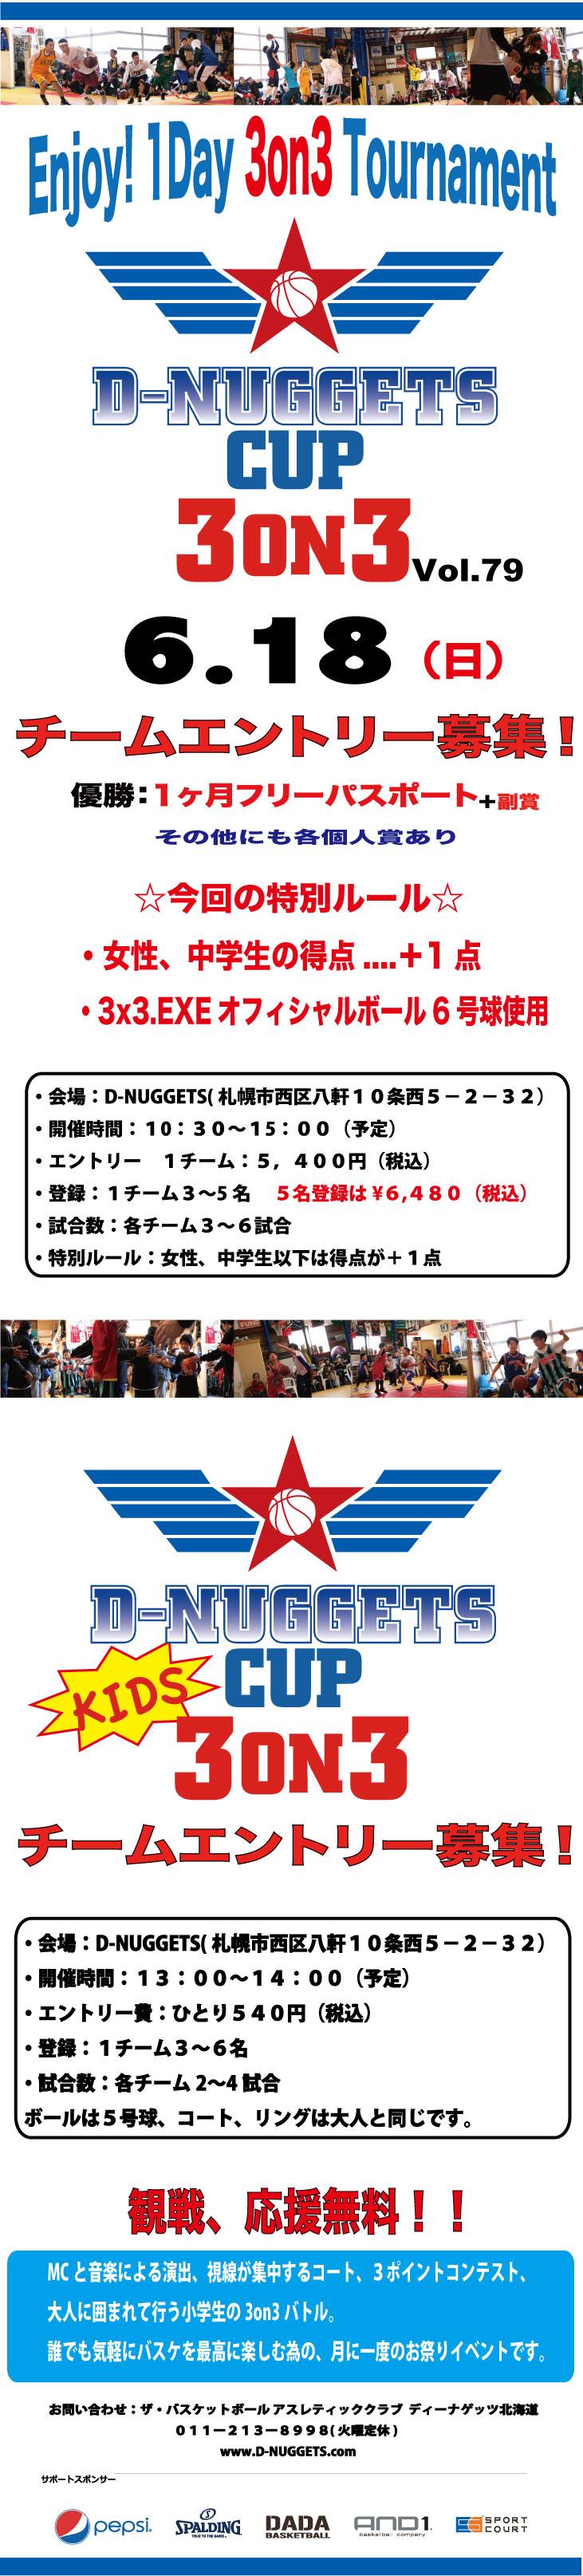 D-NUGGETS-CUP-HOKKAIDO-Vol.79.jpg